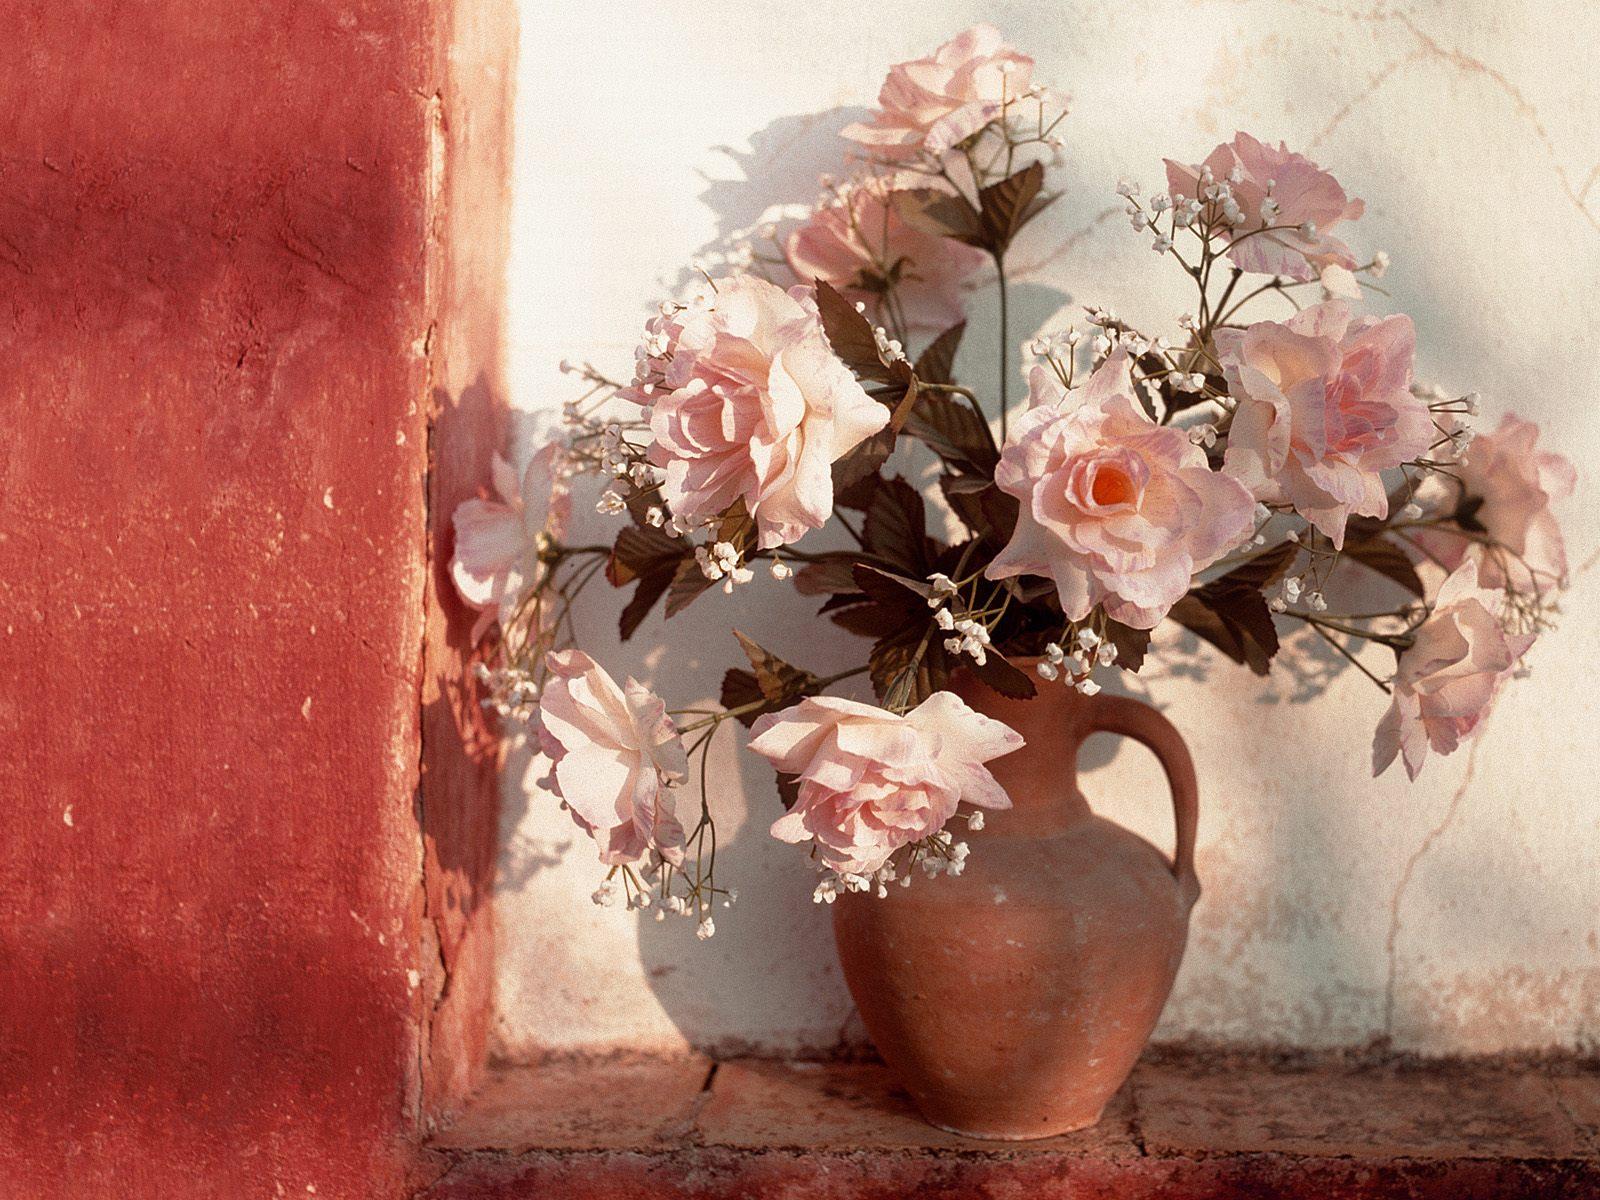 Bouquet De Fleurs Wallpaper Fond D Ecran Photo